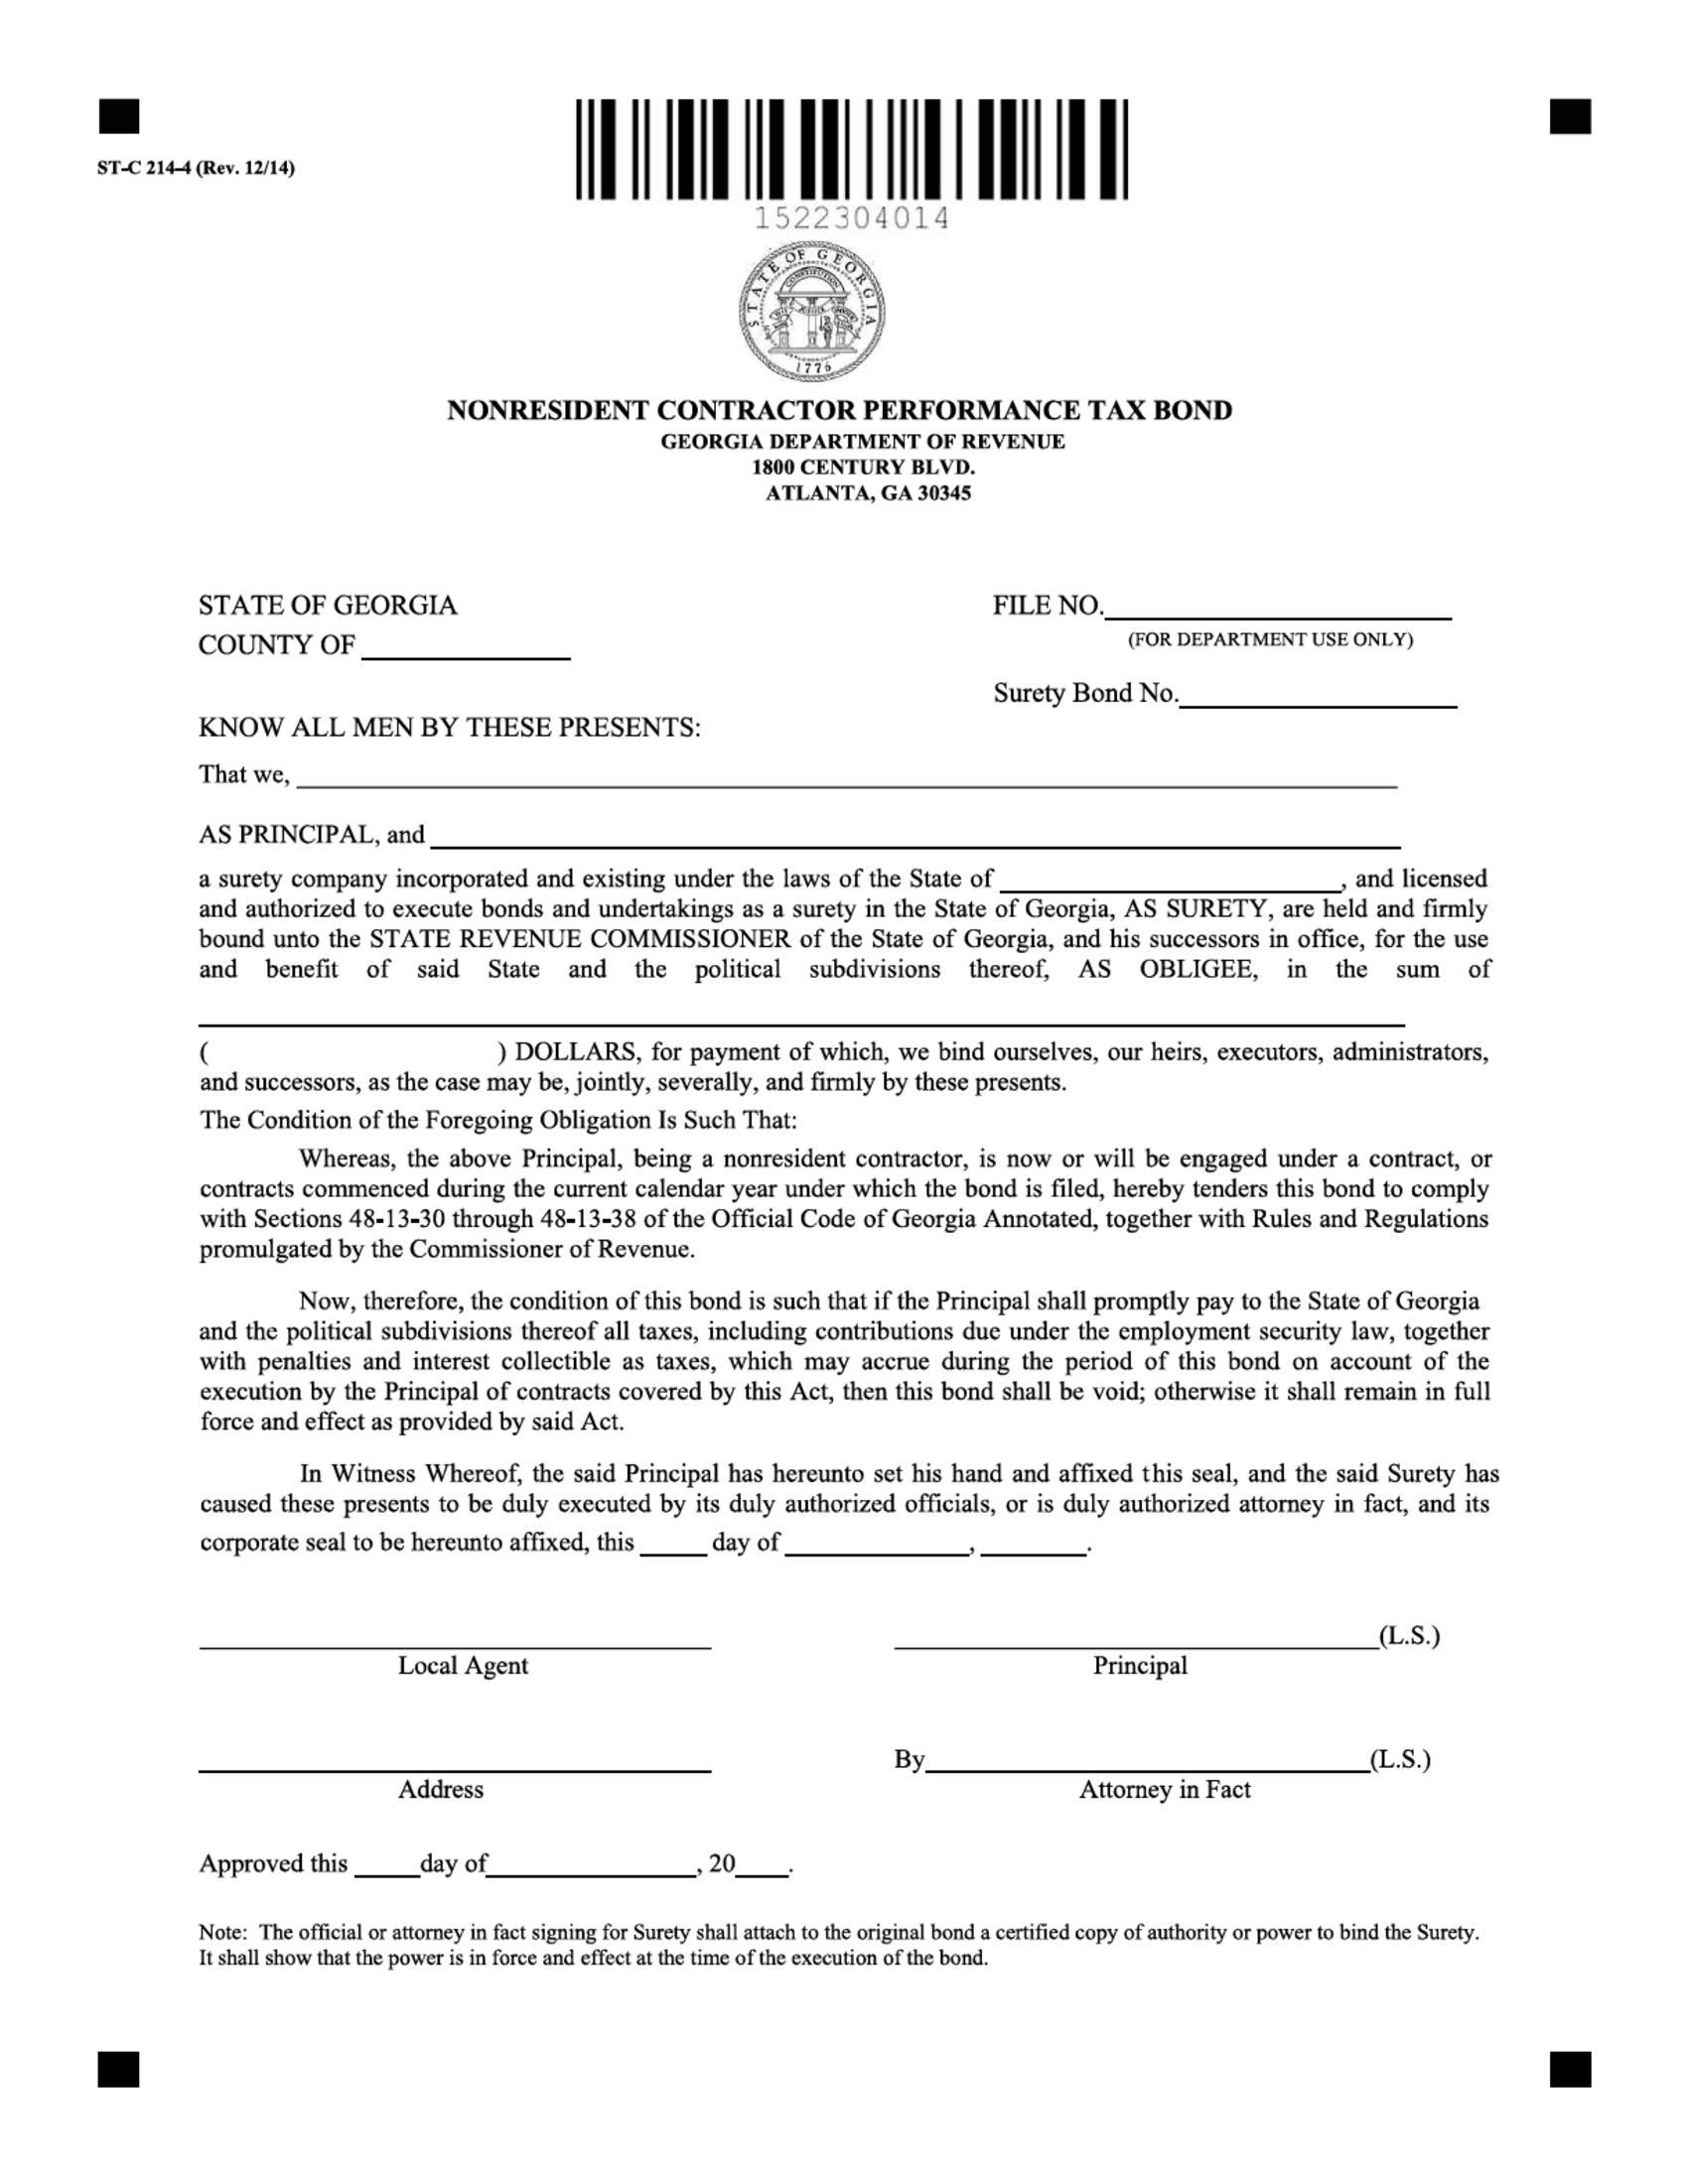 Georgia Department of Revenue Nonresident Contractor's Performance Tax Bond sample image